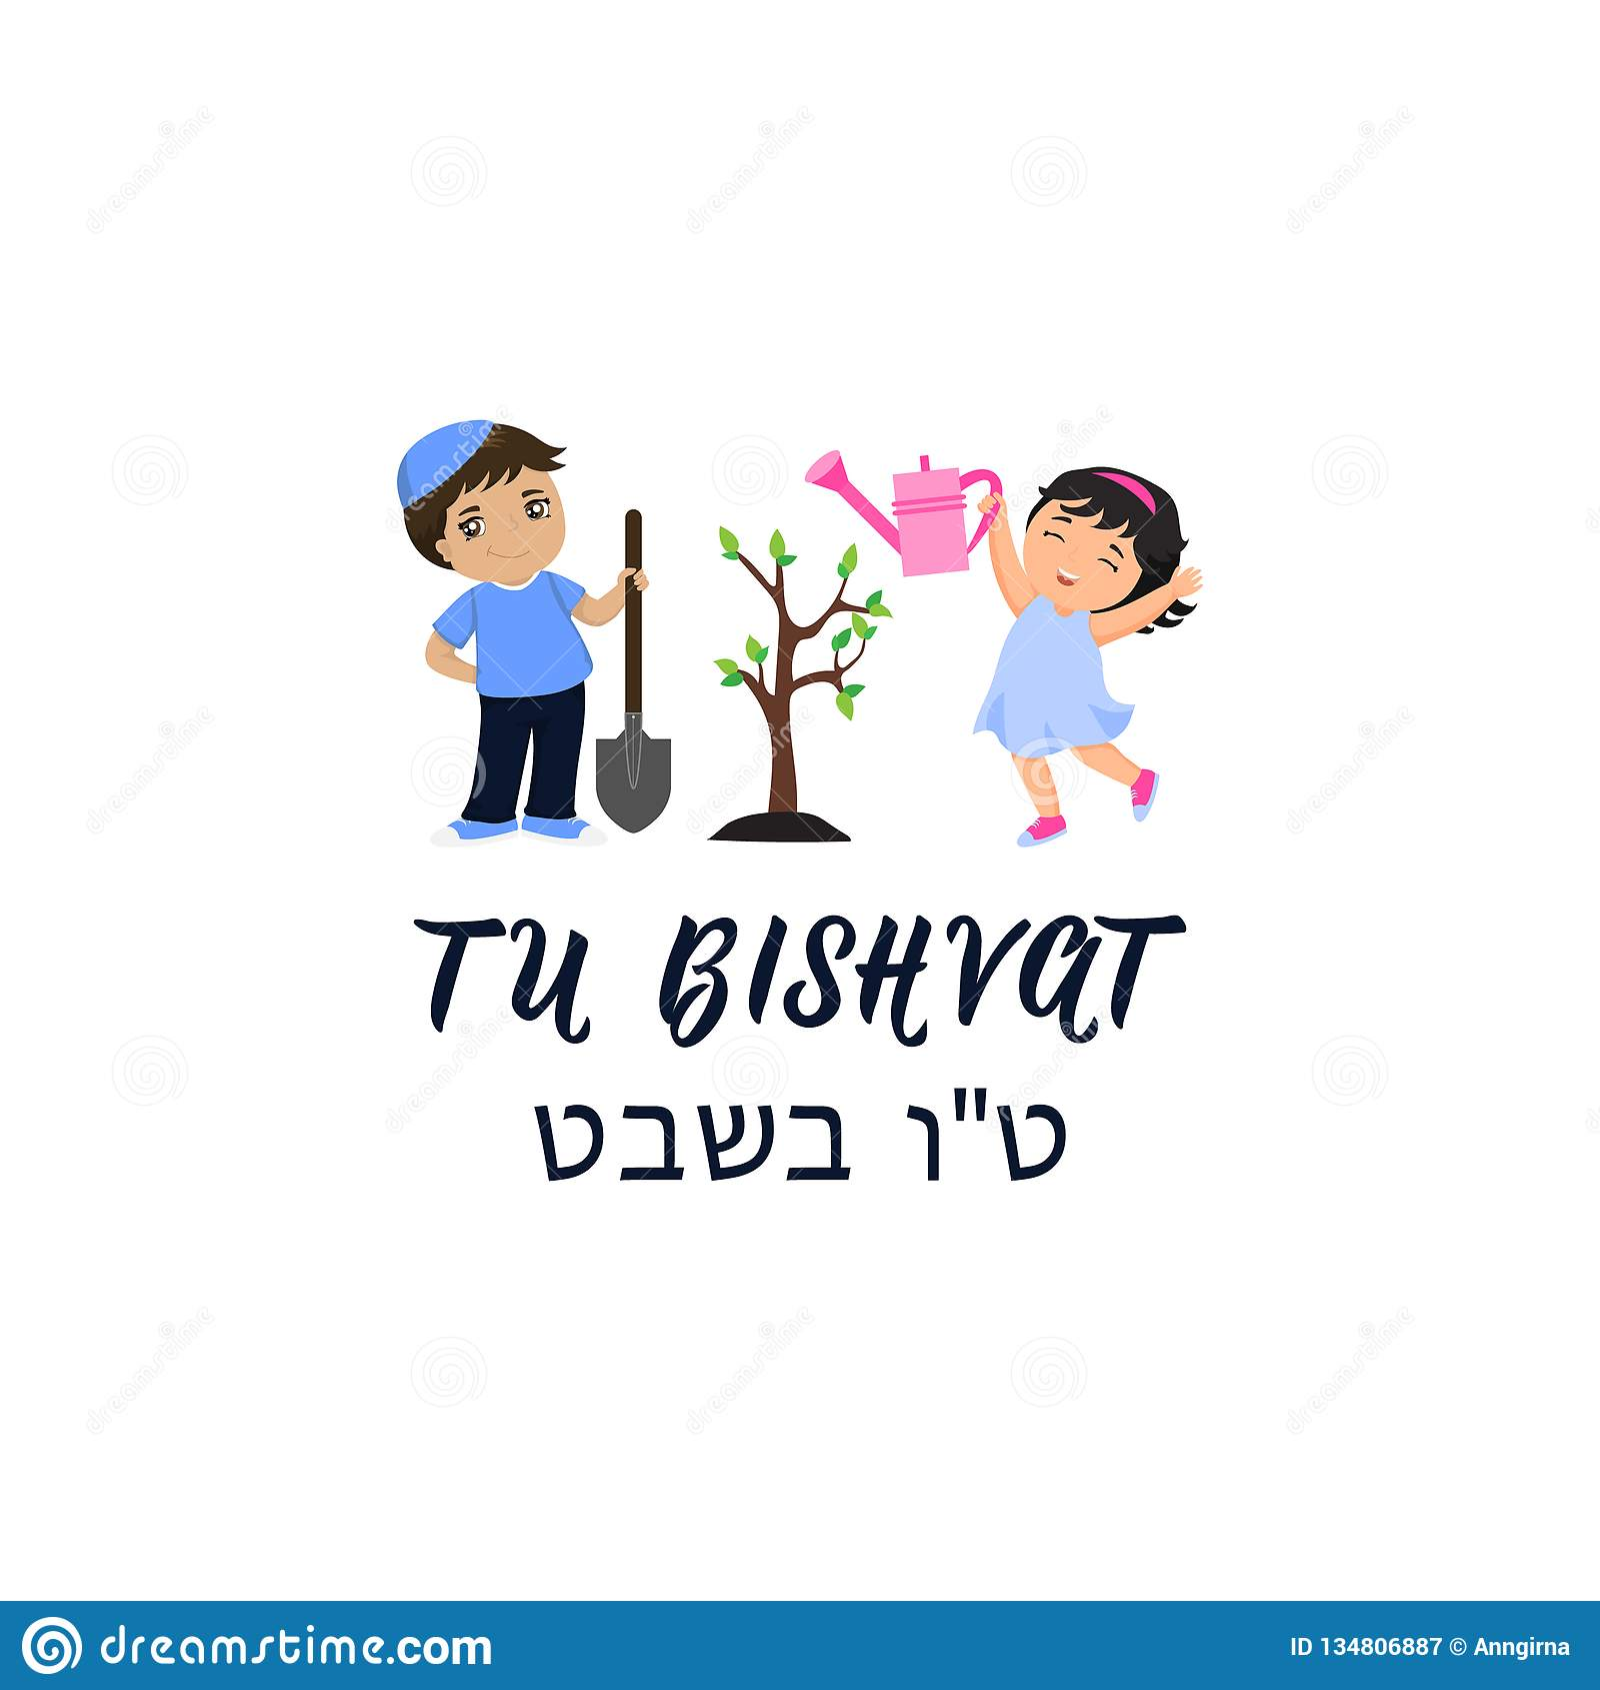 TU bishvat εγγραφή διακοπές εβραϊκές Κείμενο στα εβραϊκά - νέο έτος δέντρων λογότυπο κατσικιών